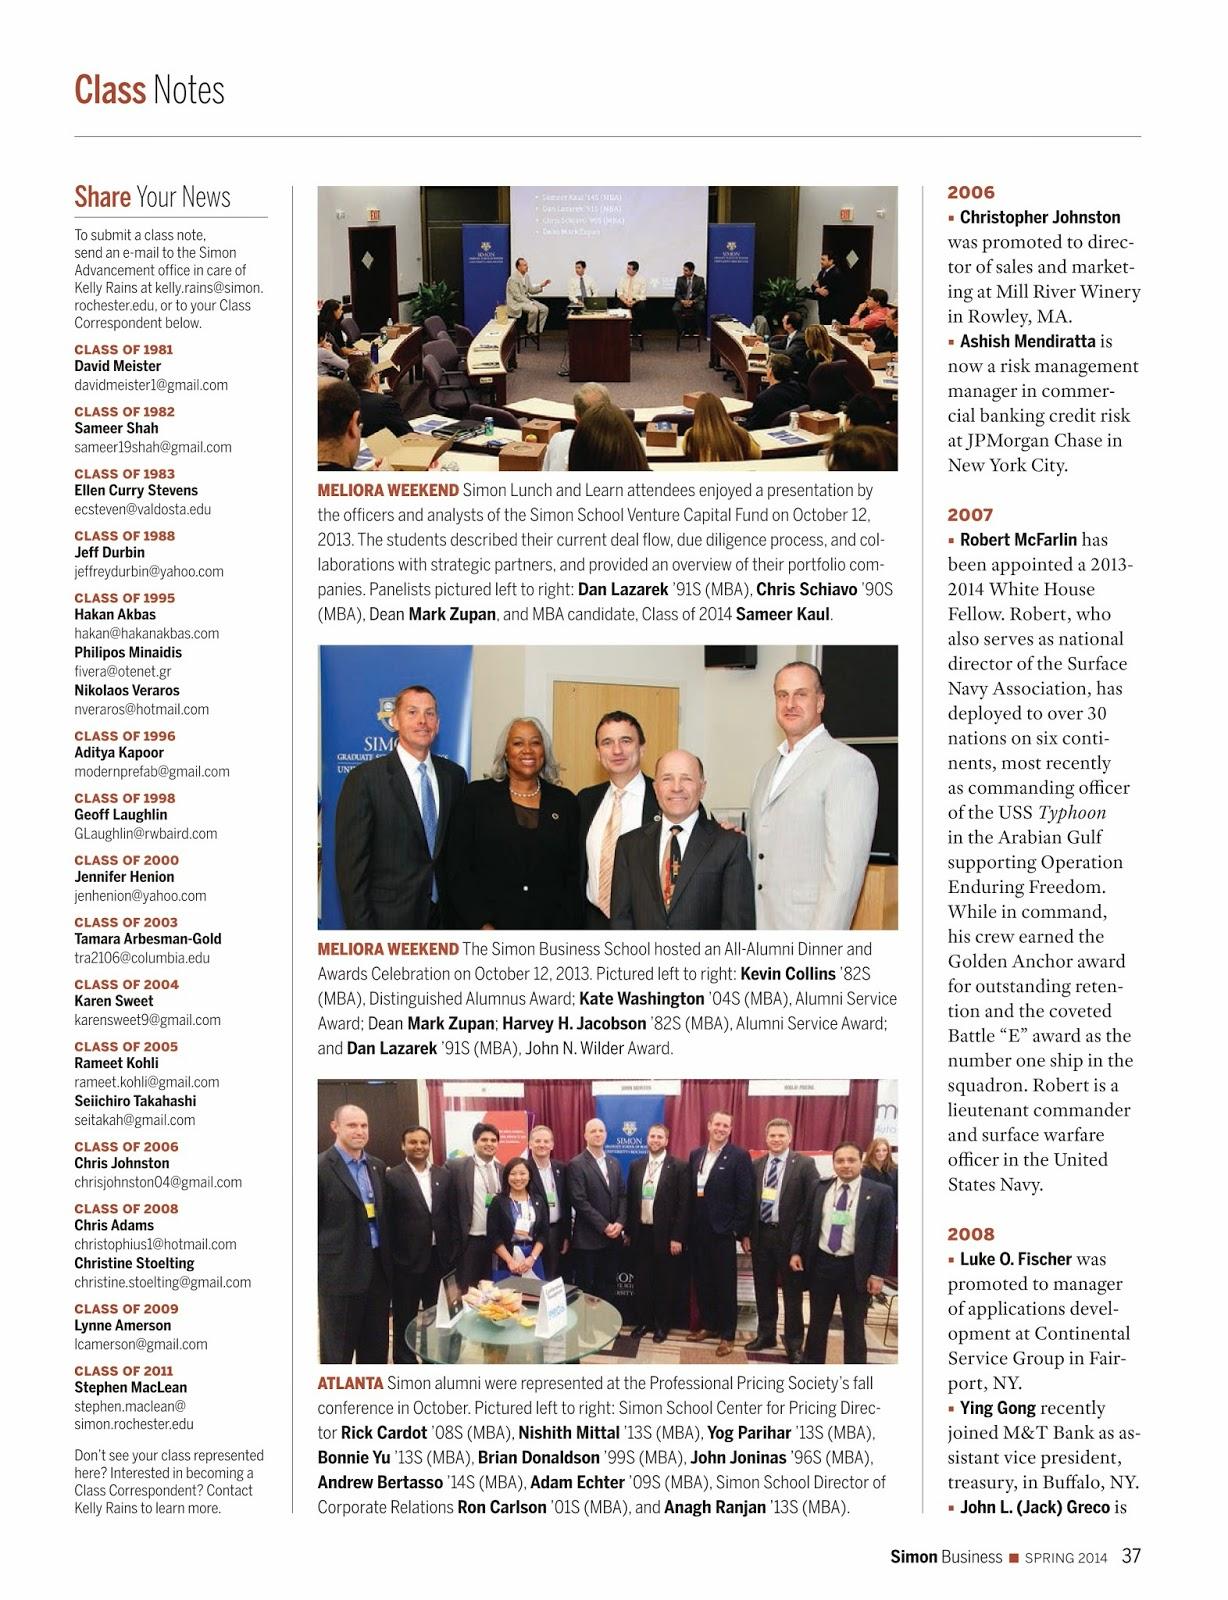 Class Notes - Simon Business Magazine